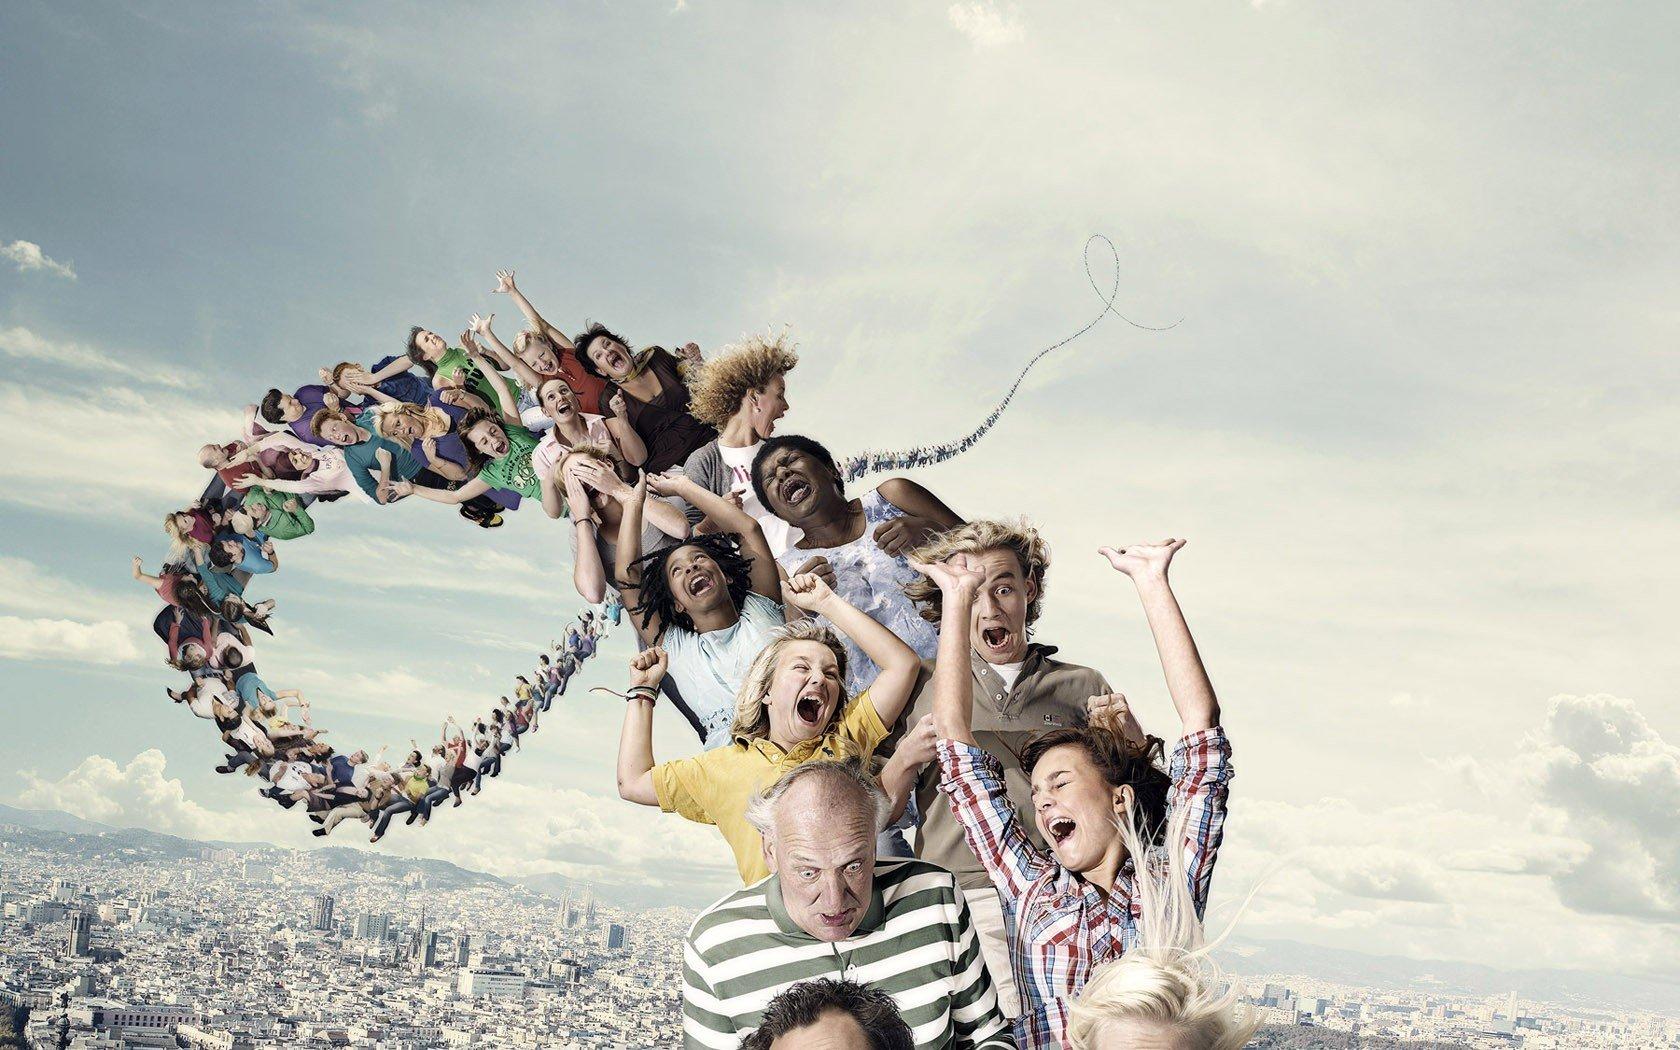 Amazing rollercoaster